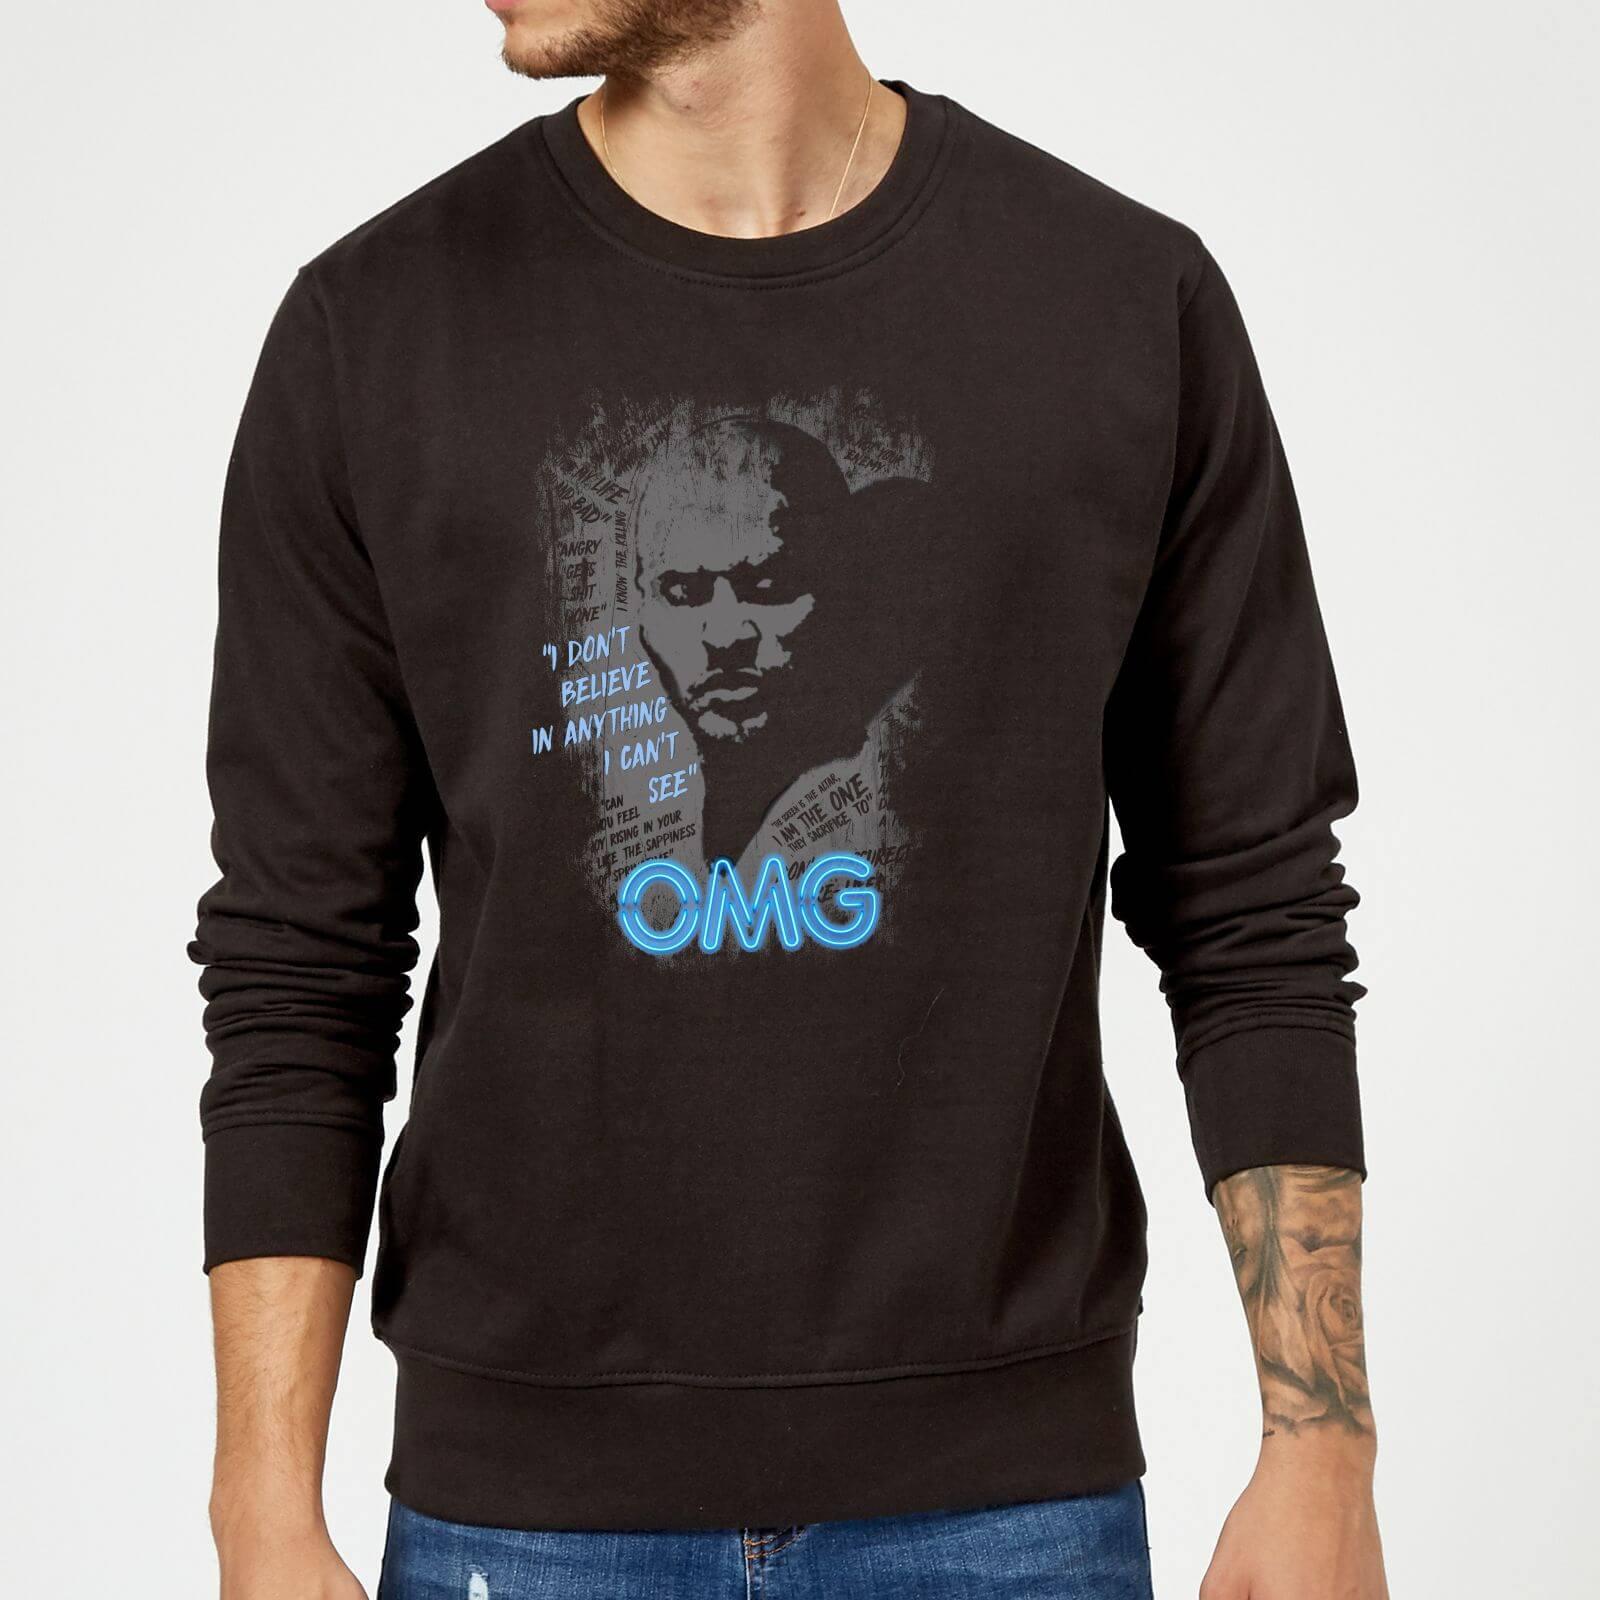 American Gods Shadow OMG Sweatshirt - Black - S - Black